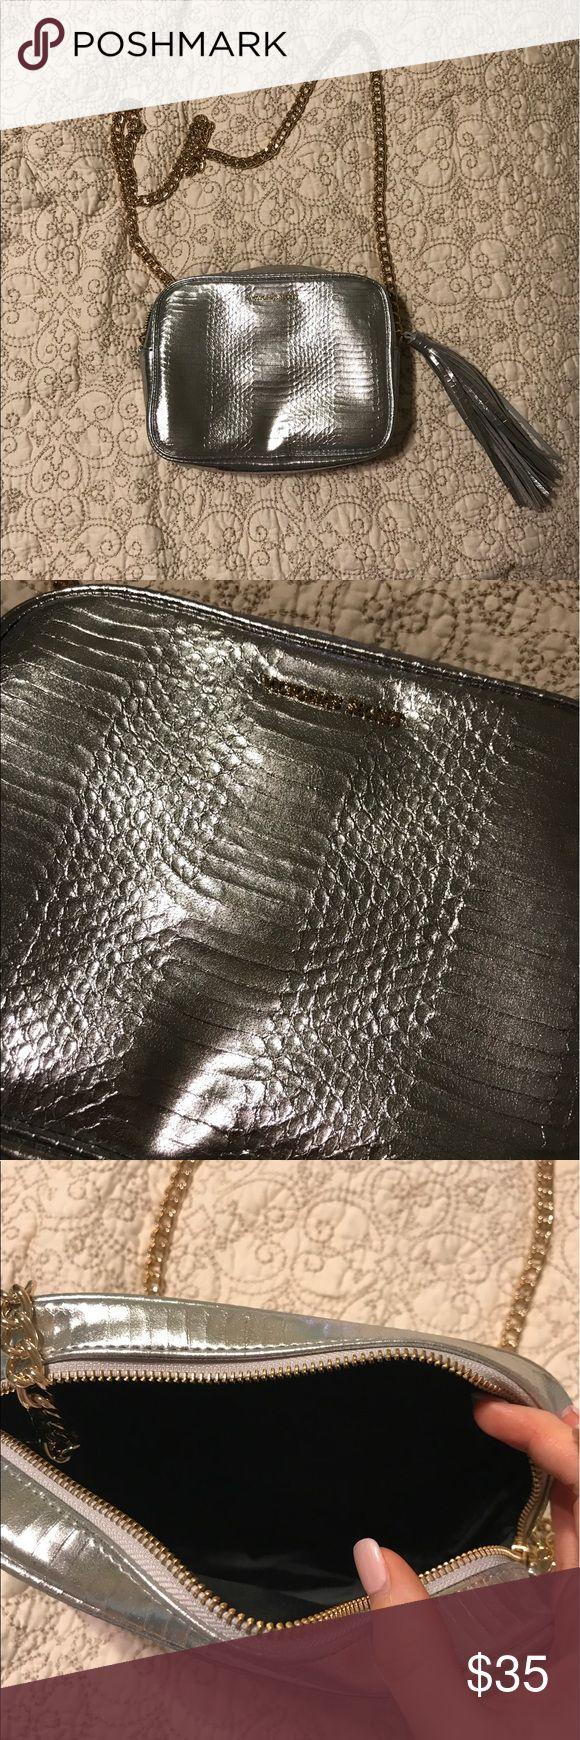 Victoria's Secret Silver Metallic Purse Brand new never used Victoria's Secret silver metallic purse. Zipper. Chain strap. Gold details (zipper, emblem on front, chain). Silver metallic tassel Victoria's Secret Bags